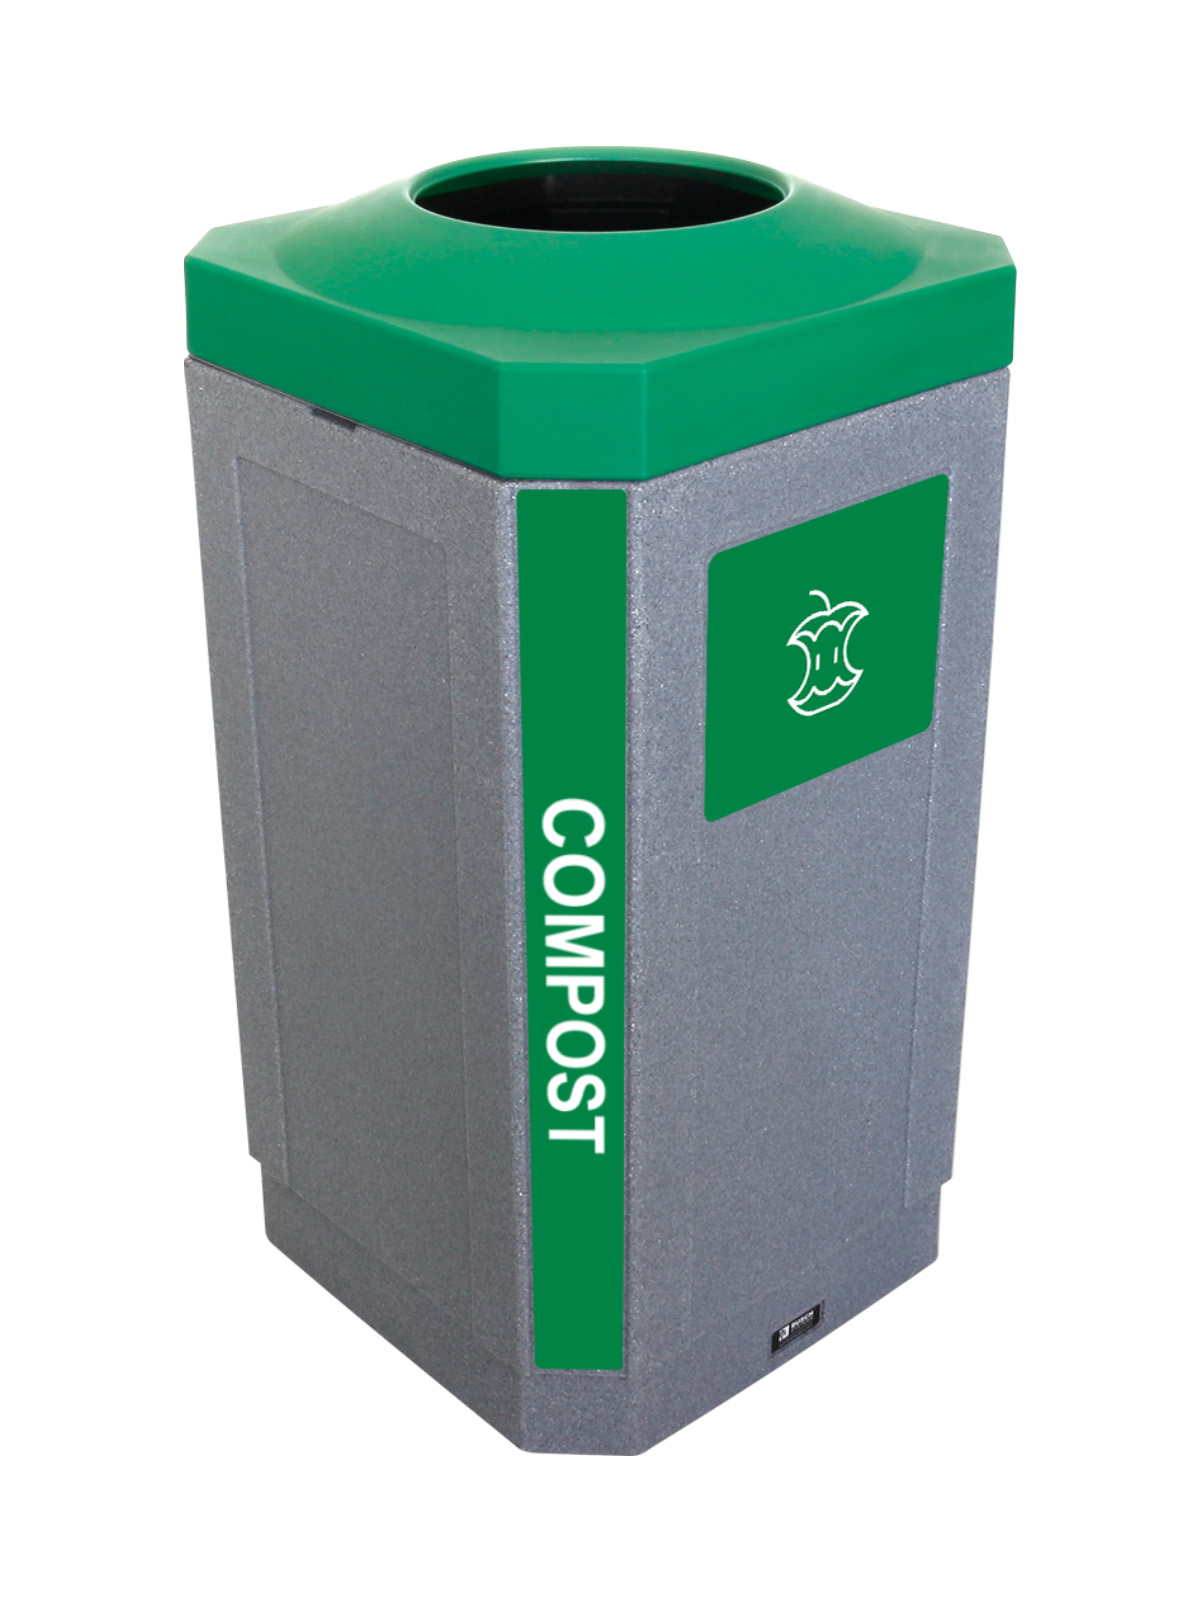 OCTO - Single - Indoor - Compost - Full - Greystone-Green